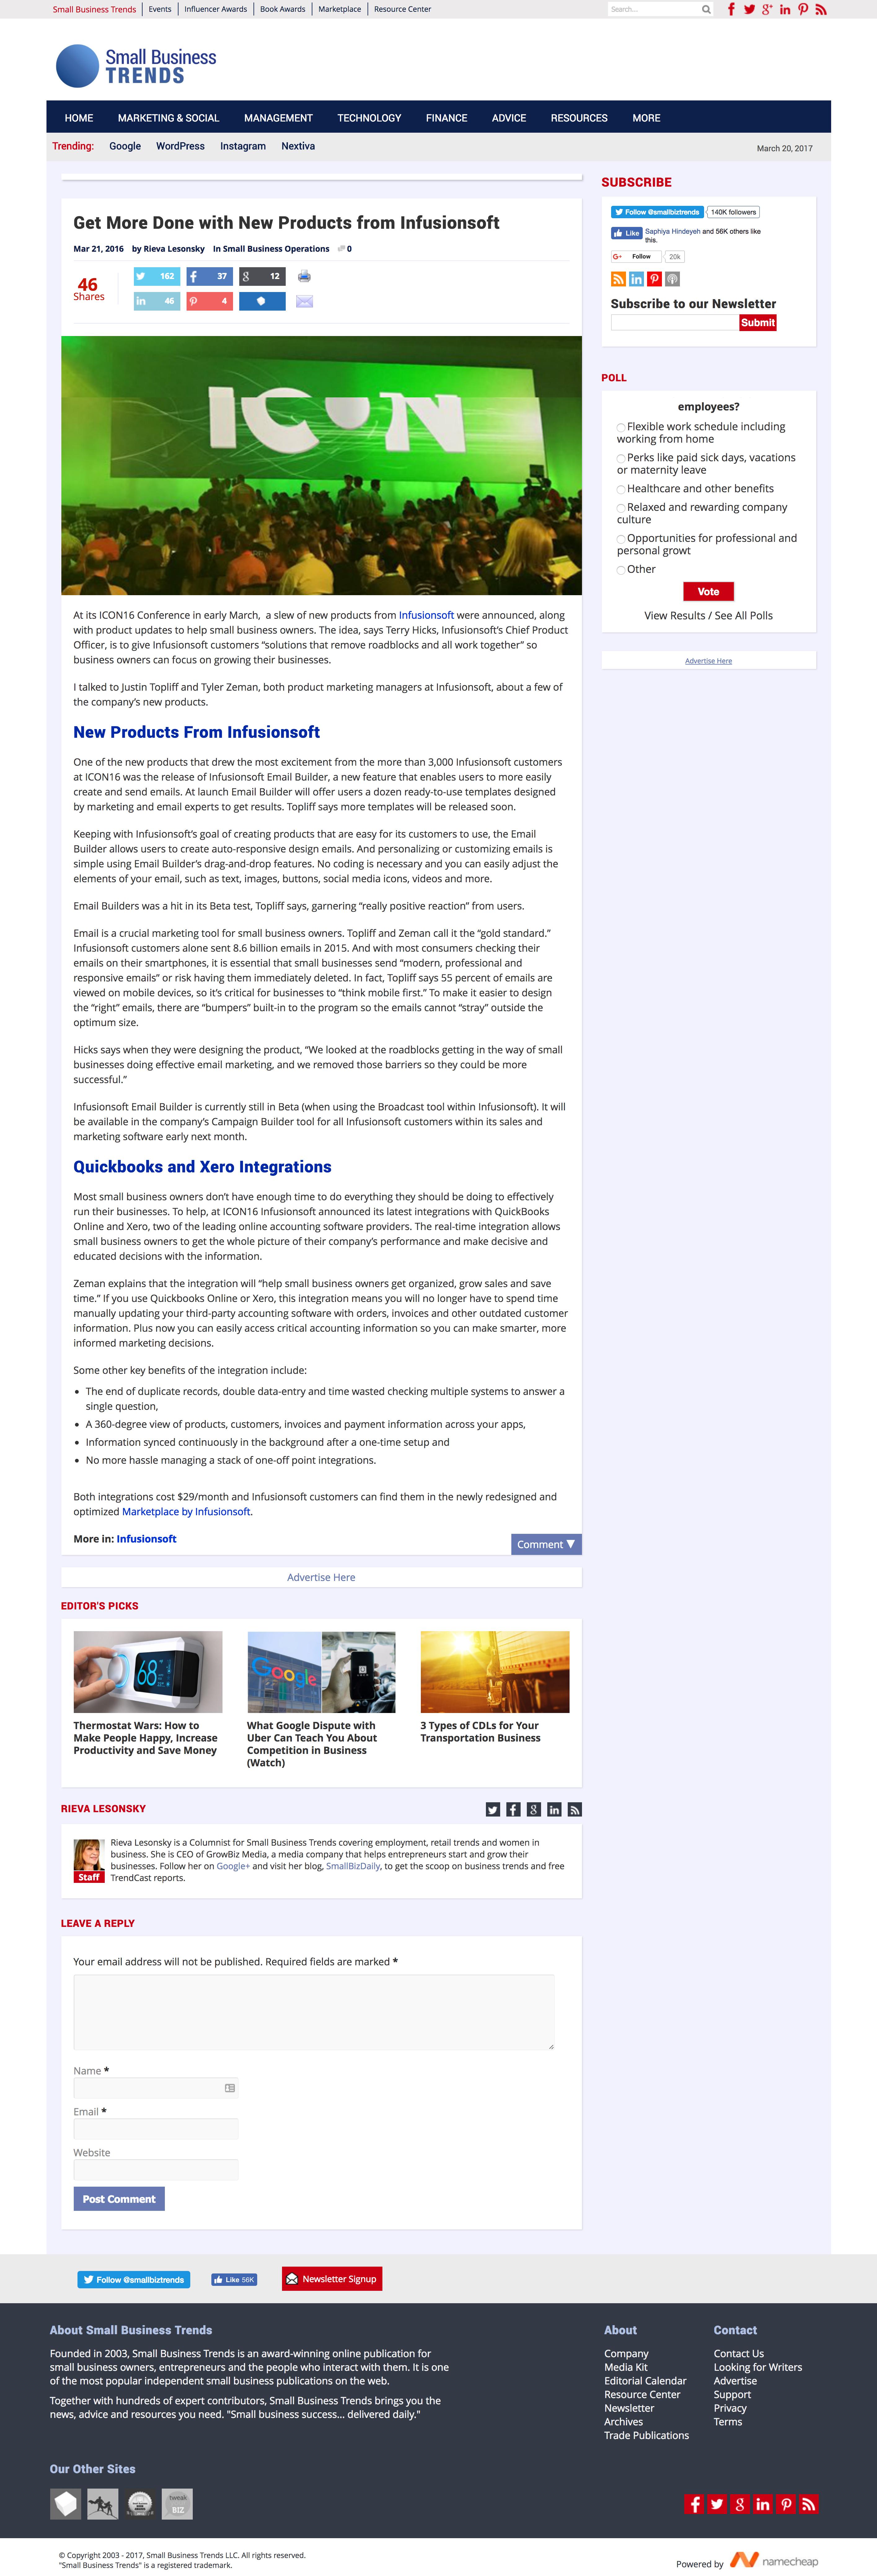 Justin Topliff Smallbiztrends infusionsoft new products